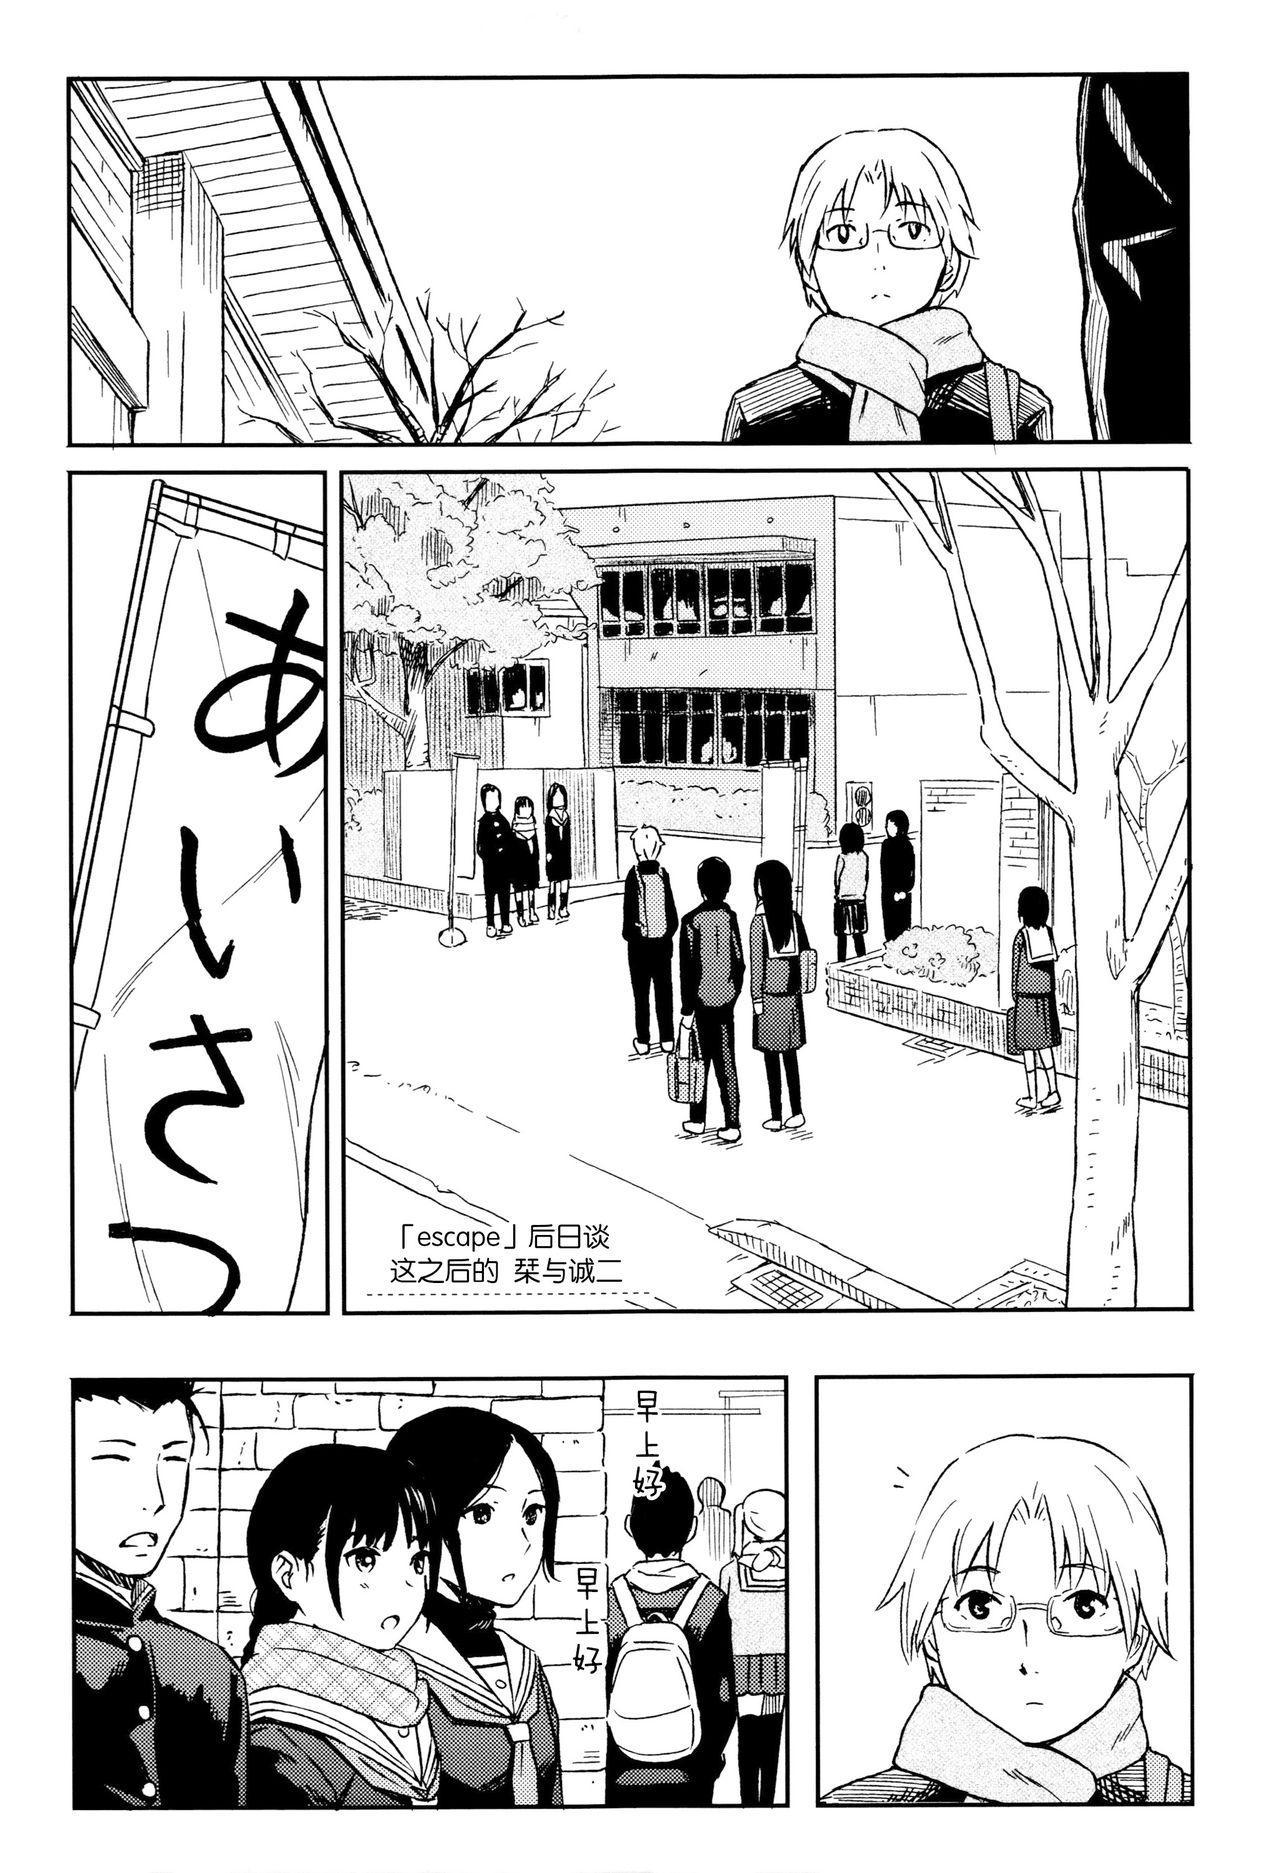 Tokubetsu na Mainichi - Special daily 117